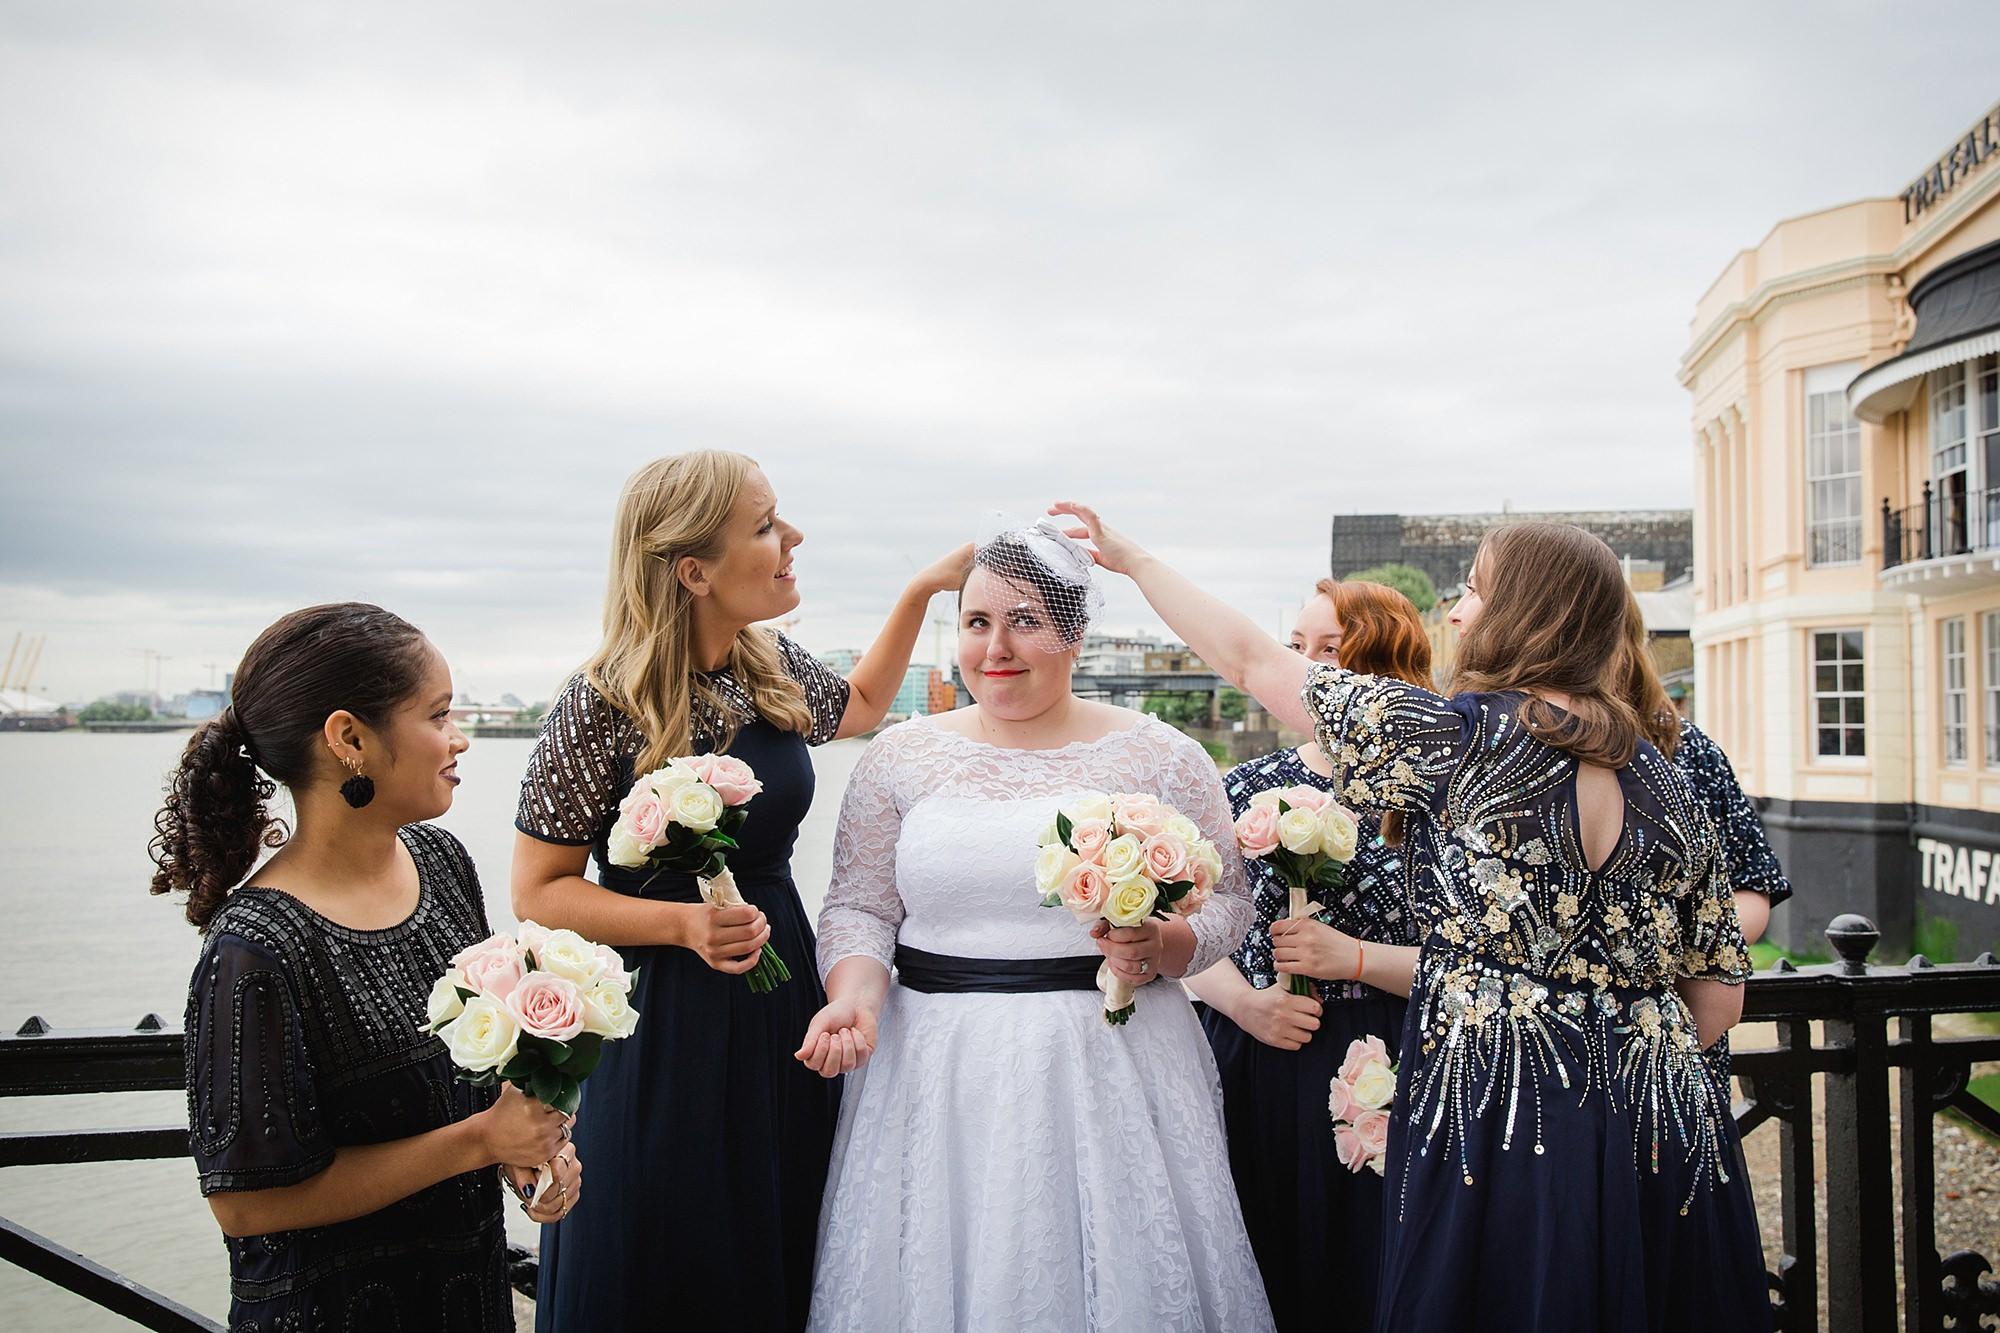 Trafalgar Tavern wedding bridesmaids get confetti out of bride's hair